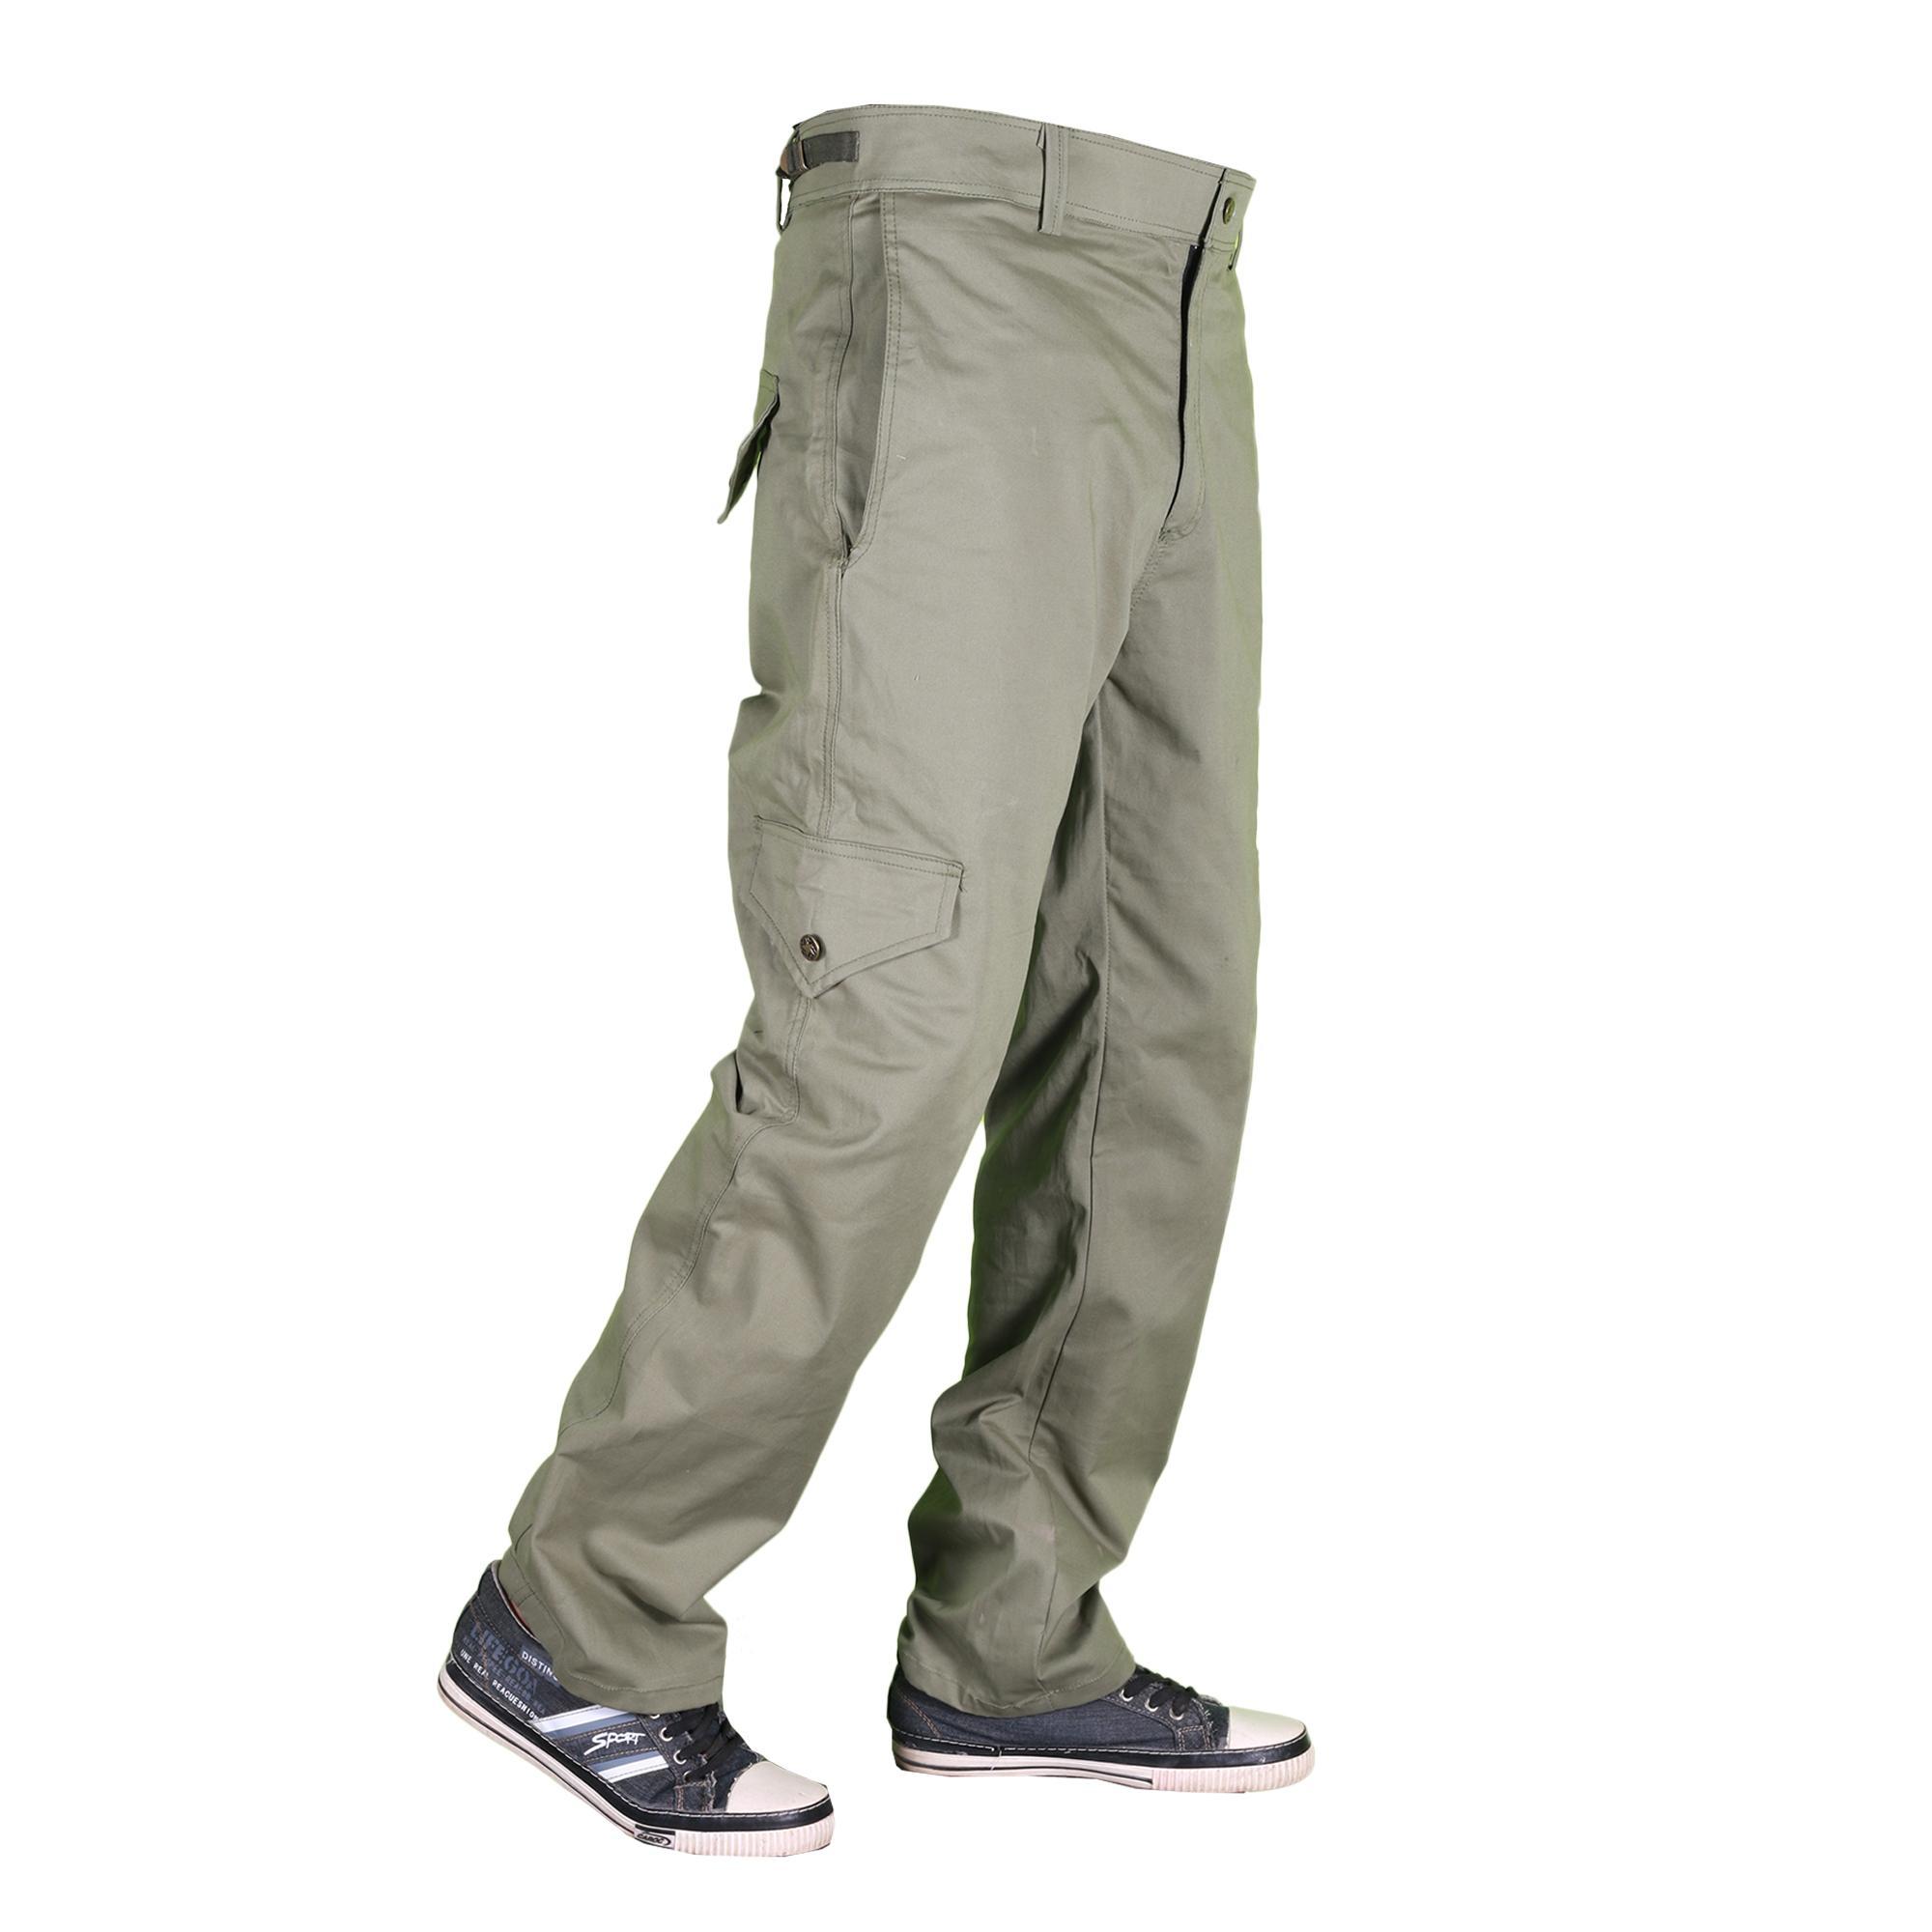 Men's New Modern Arabic Cotton Cargo Trouser - Cargo Pants